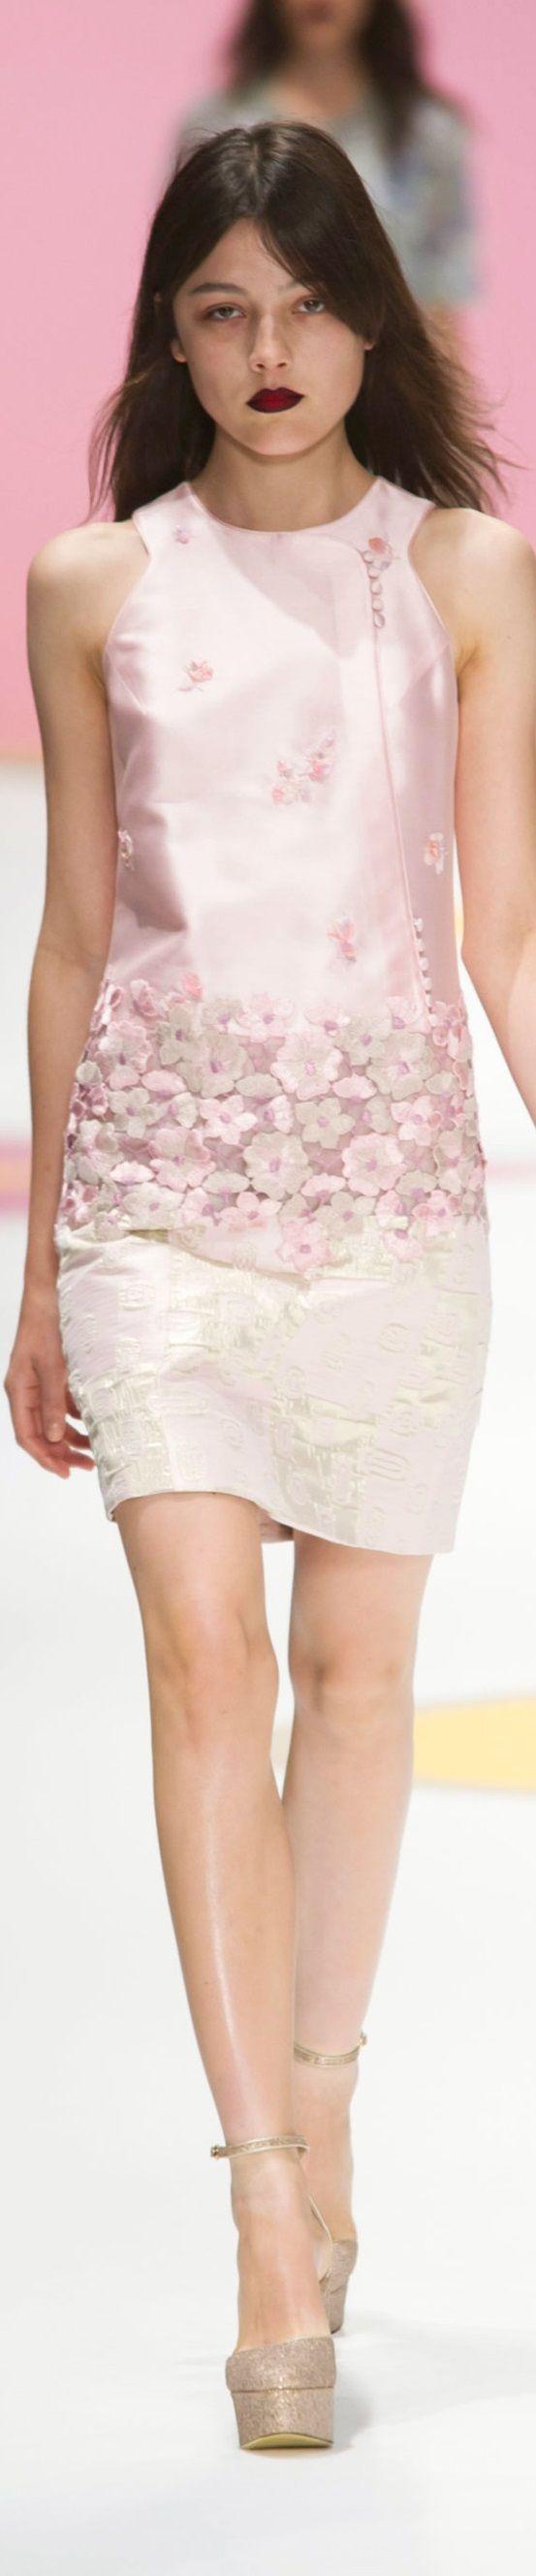 best embellished images on pinterest embroidery fashion